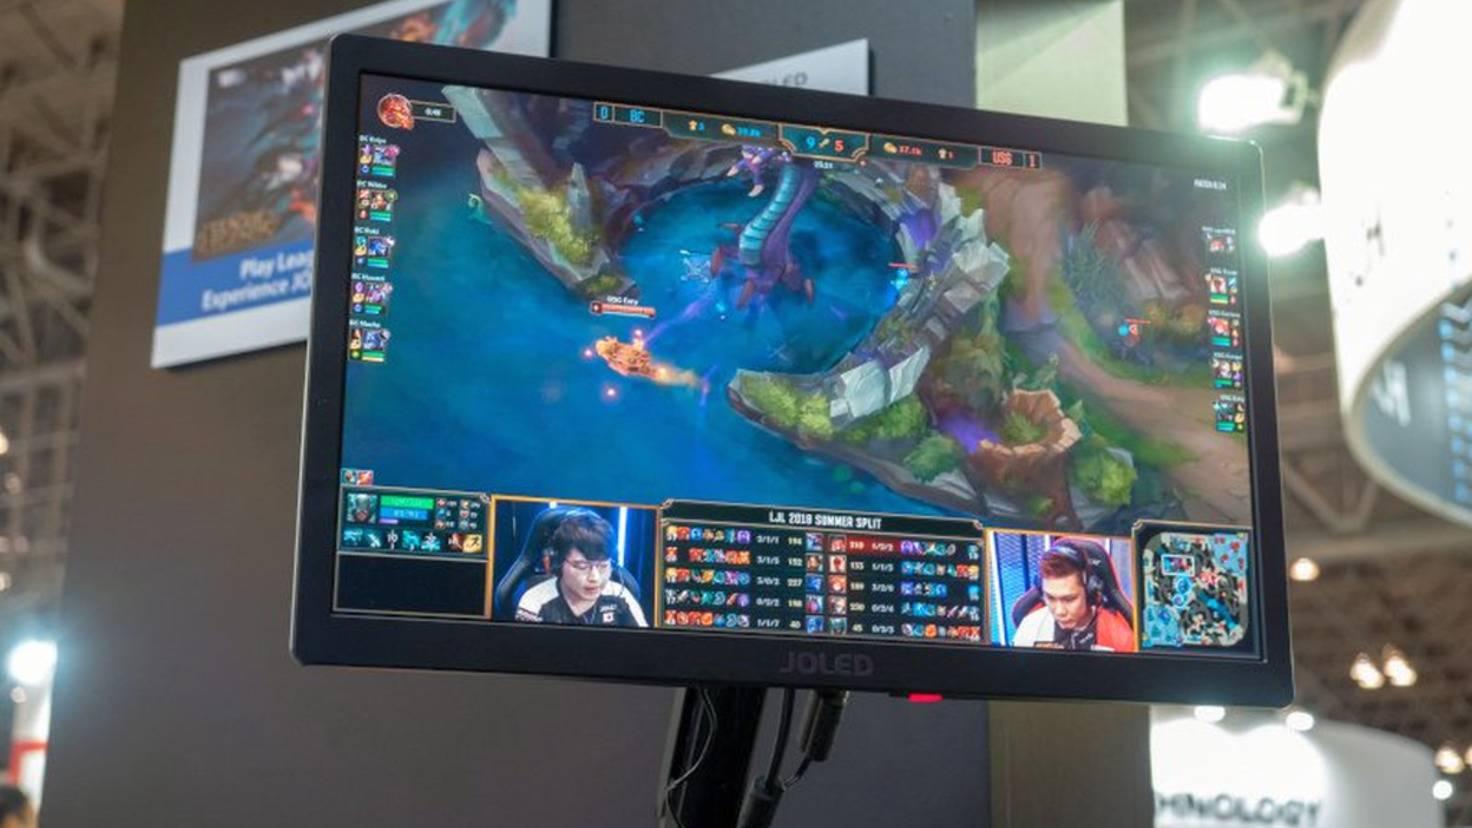 full-hd-oled-gaming-monitor-joled-burning-core